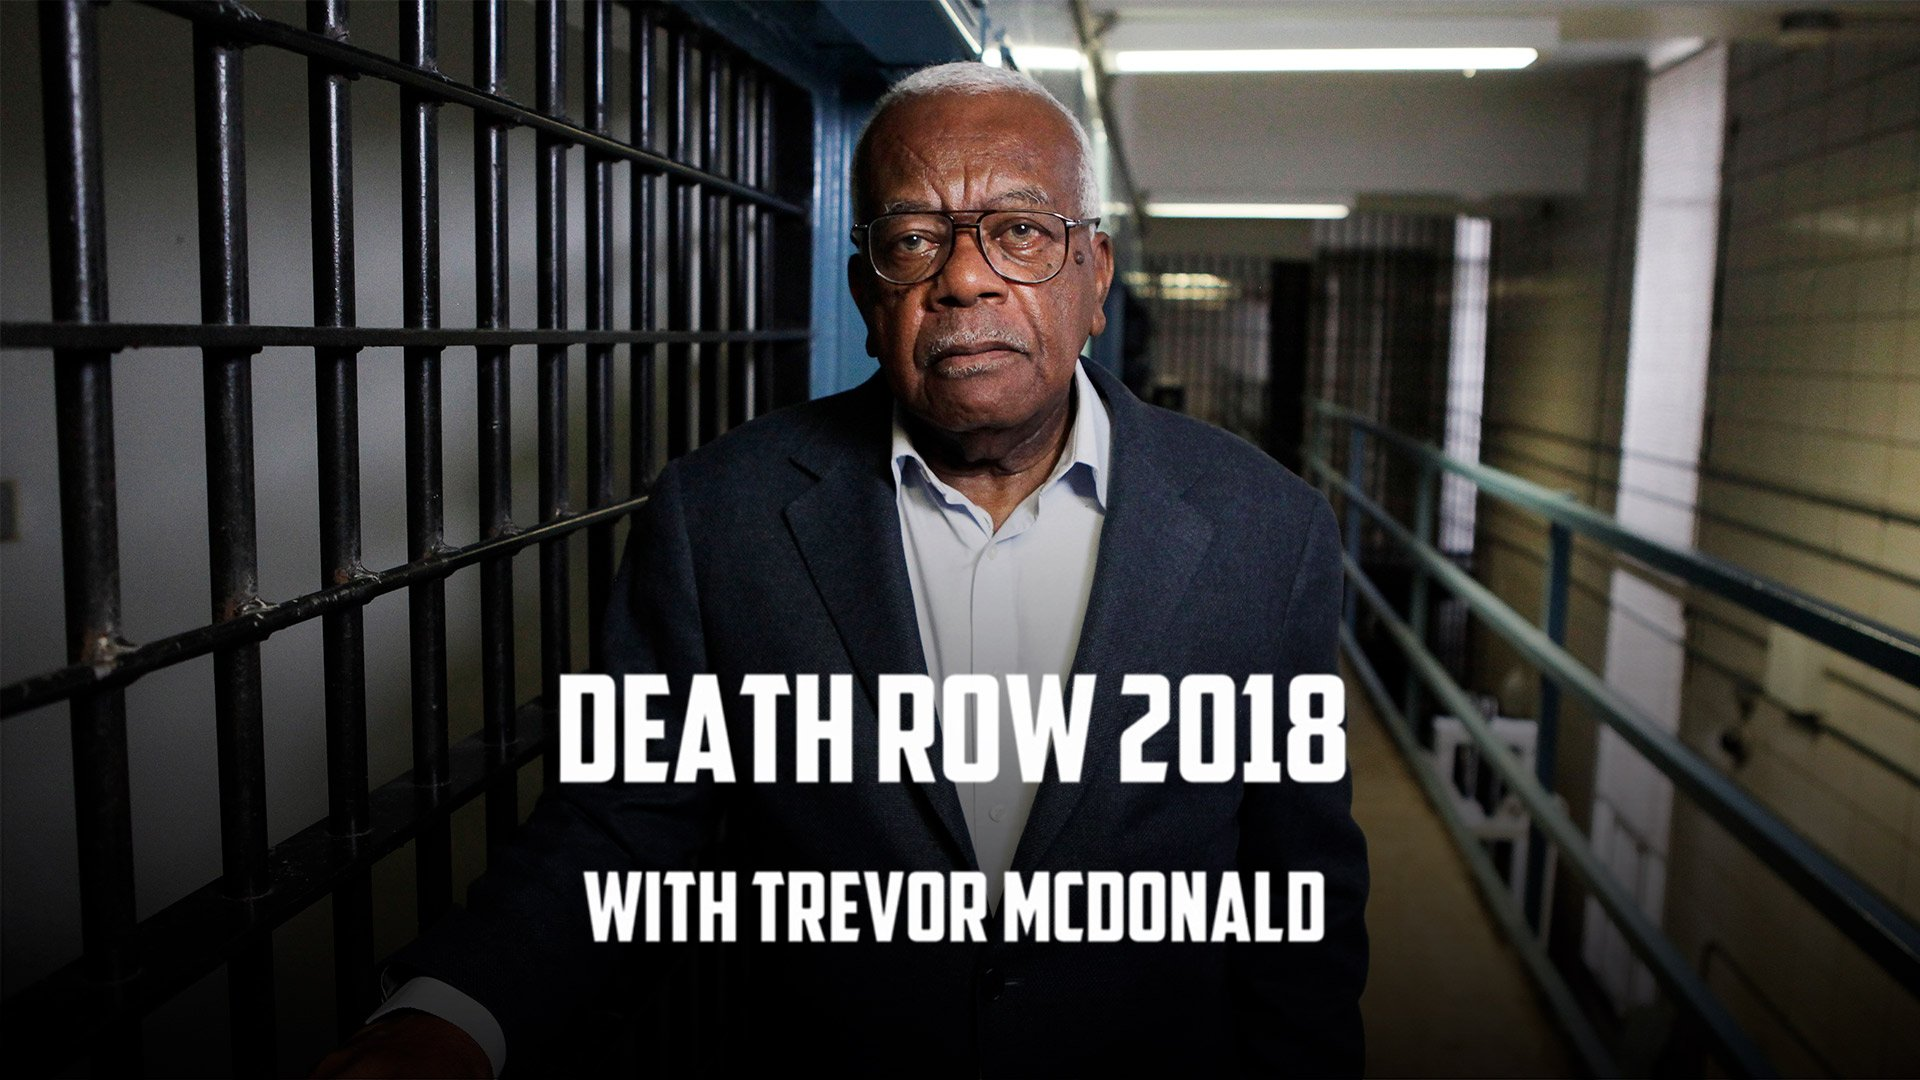 Death Row 2018 With Trevor McDonald on BritBox UK